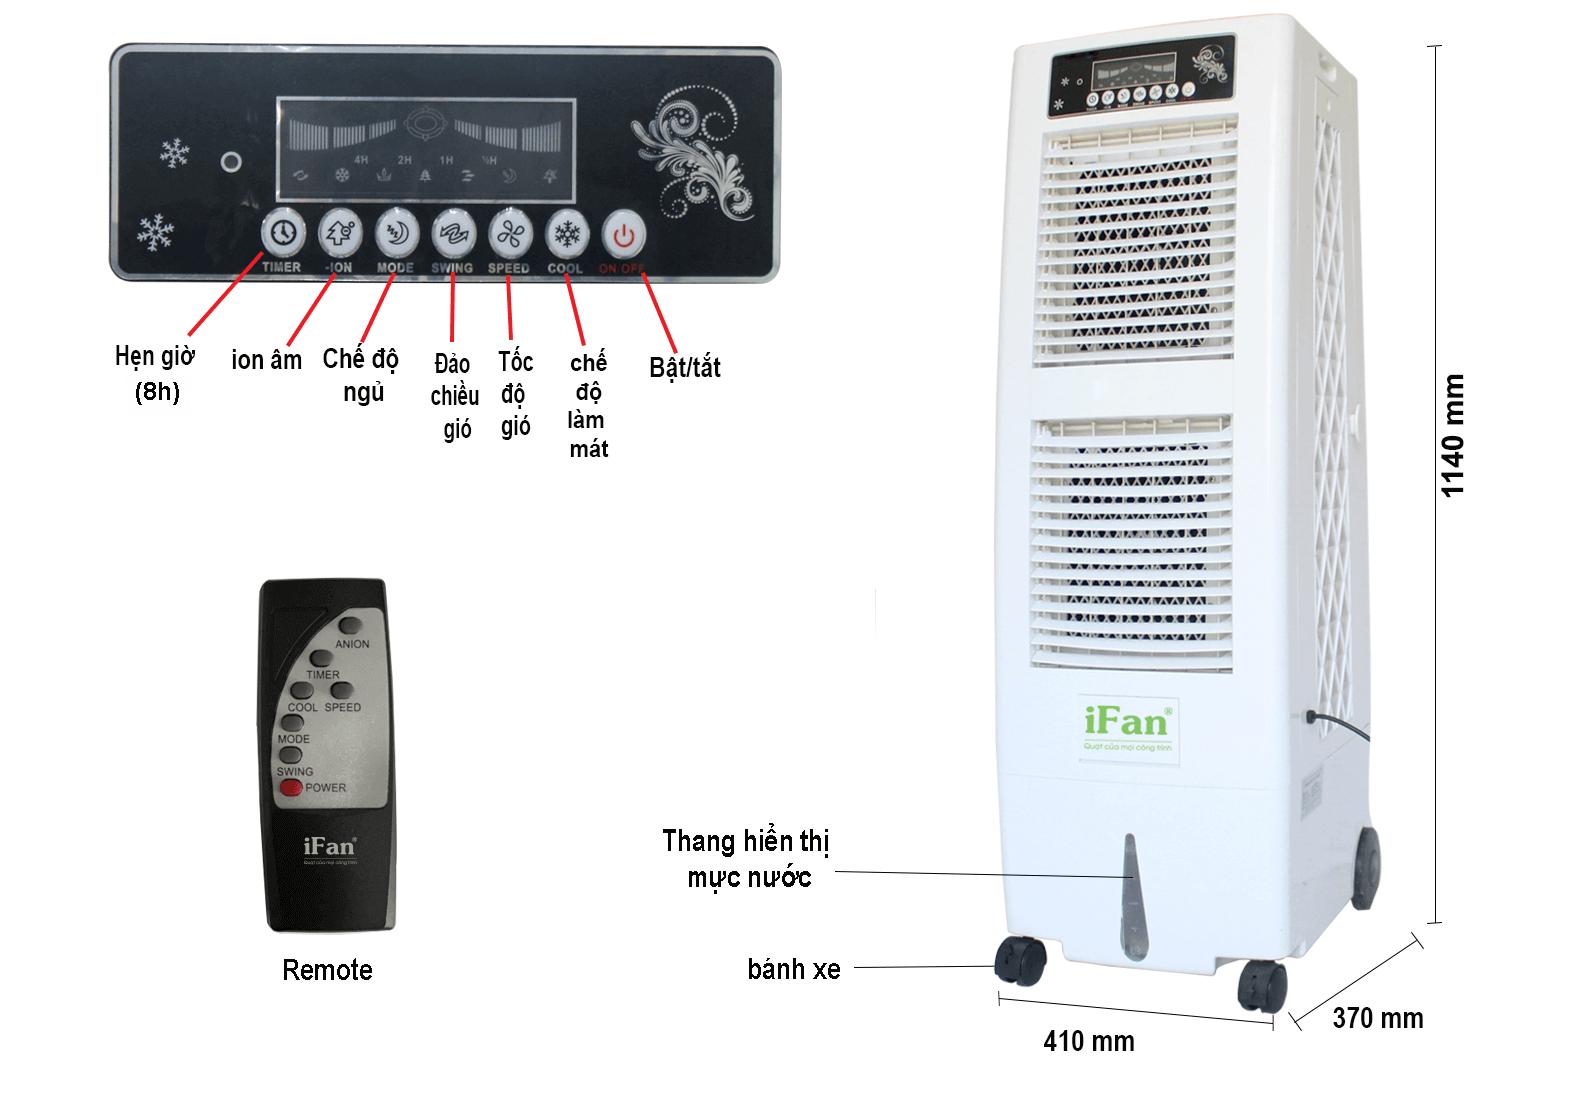 Máy làm mát iFan-400